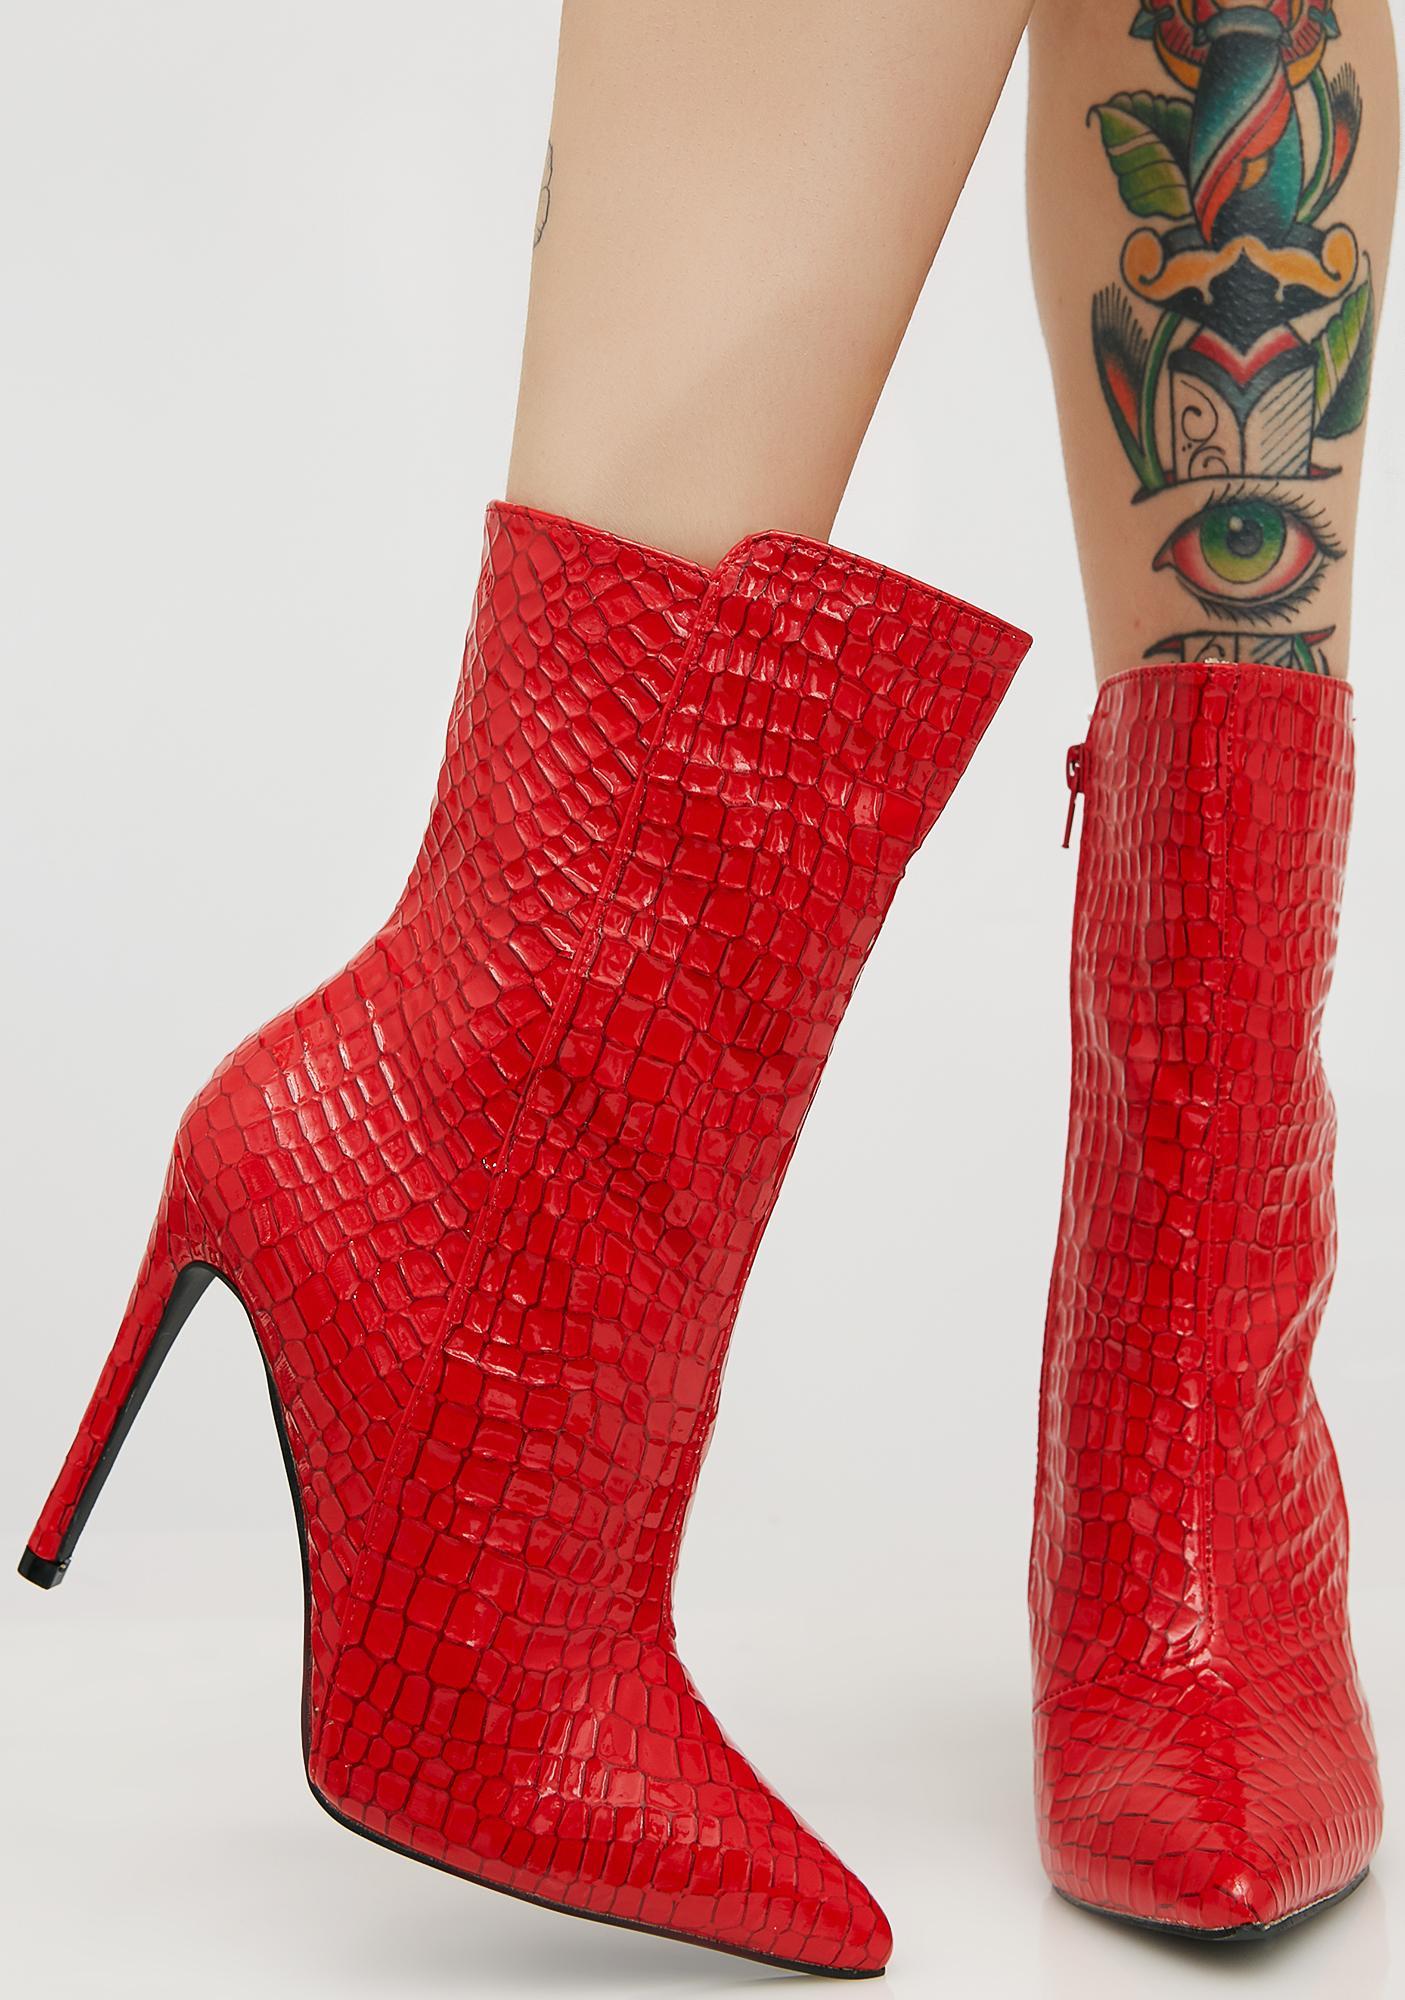 sale online Public Desire Public Desire Spike Mesh Stiletto Heel Ankle Boots Red clearance shopping online top quality online cheap buy authentic hot sale cheap online Dzj1fXNTl